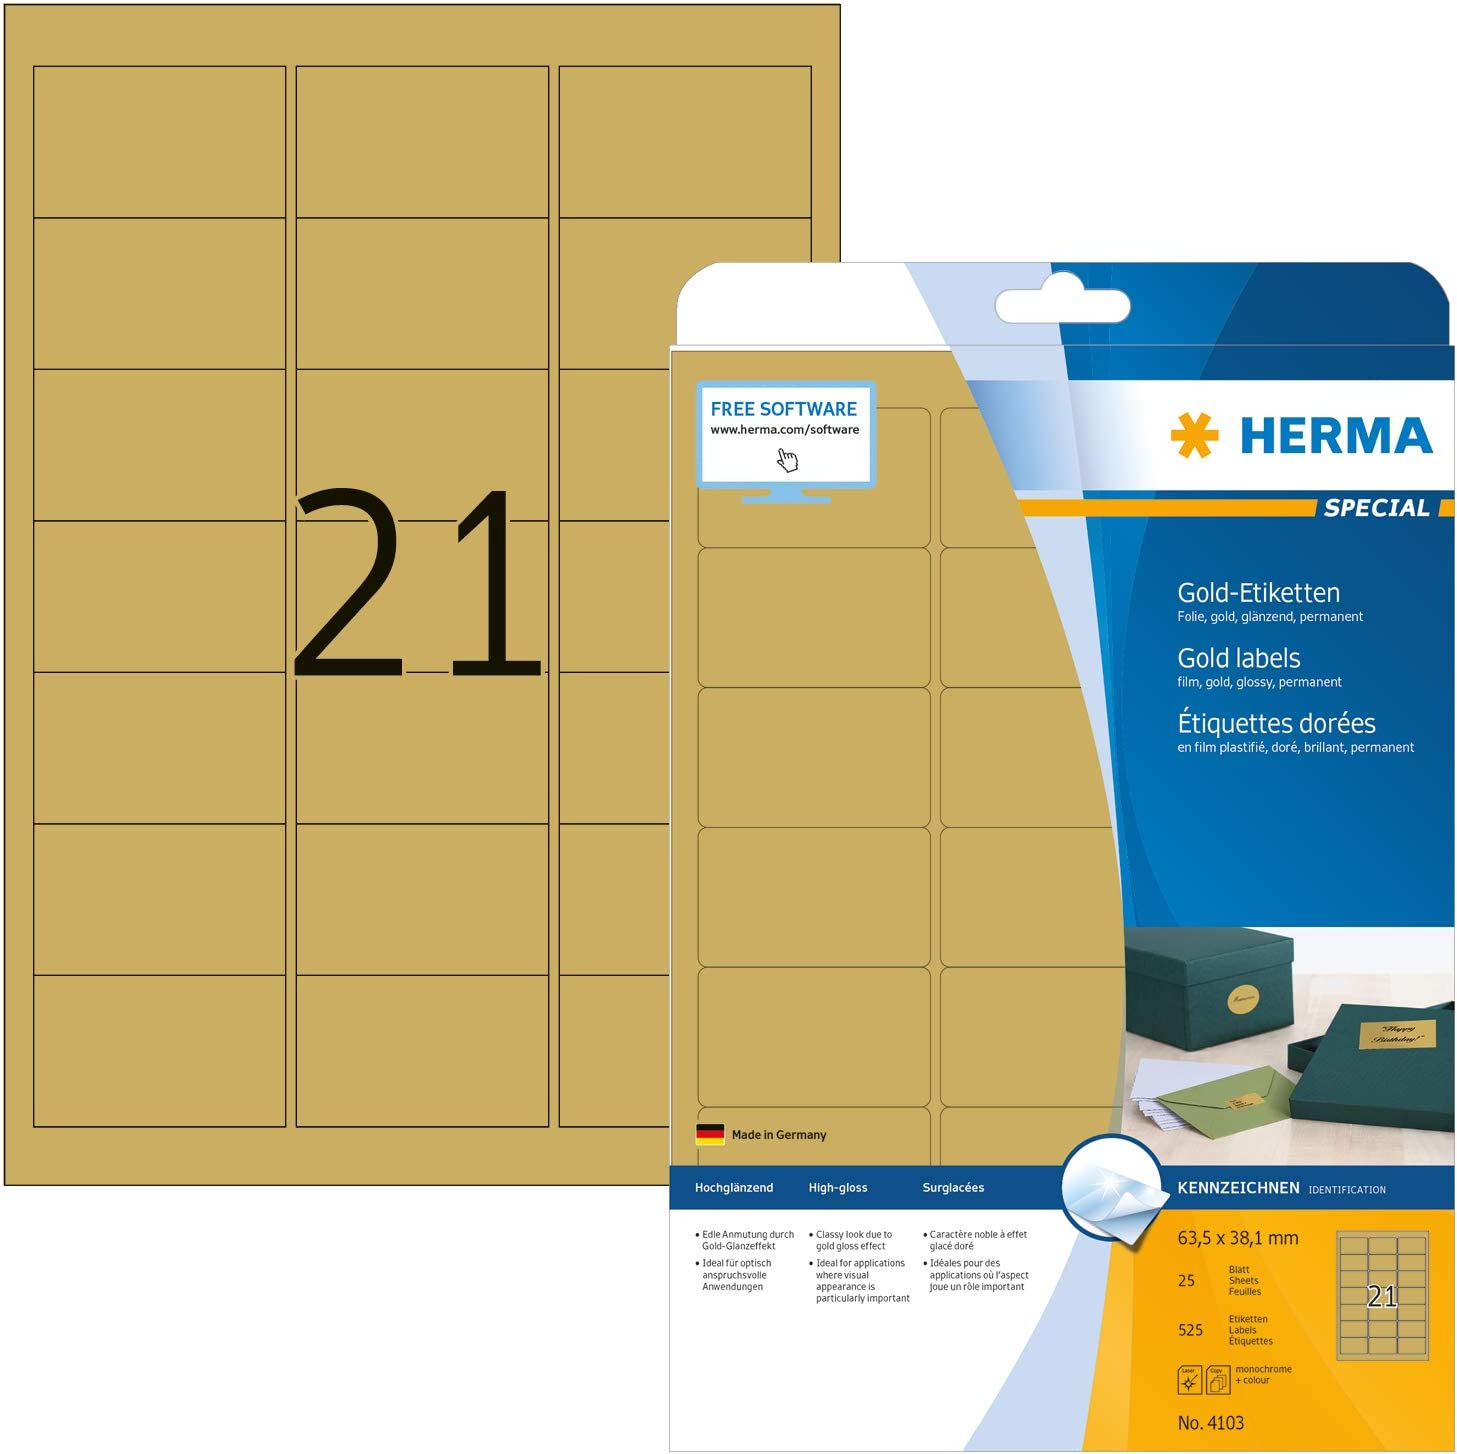 HERMA Folien-Etiketten SPECIAL, 63,5 x 38,1 mm, gold